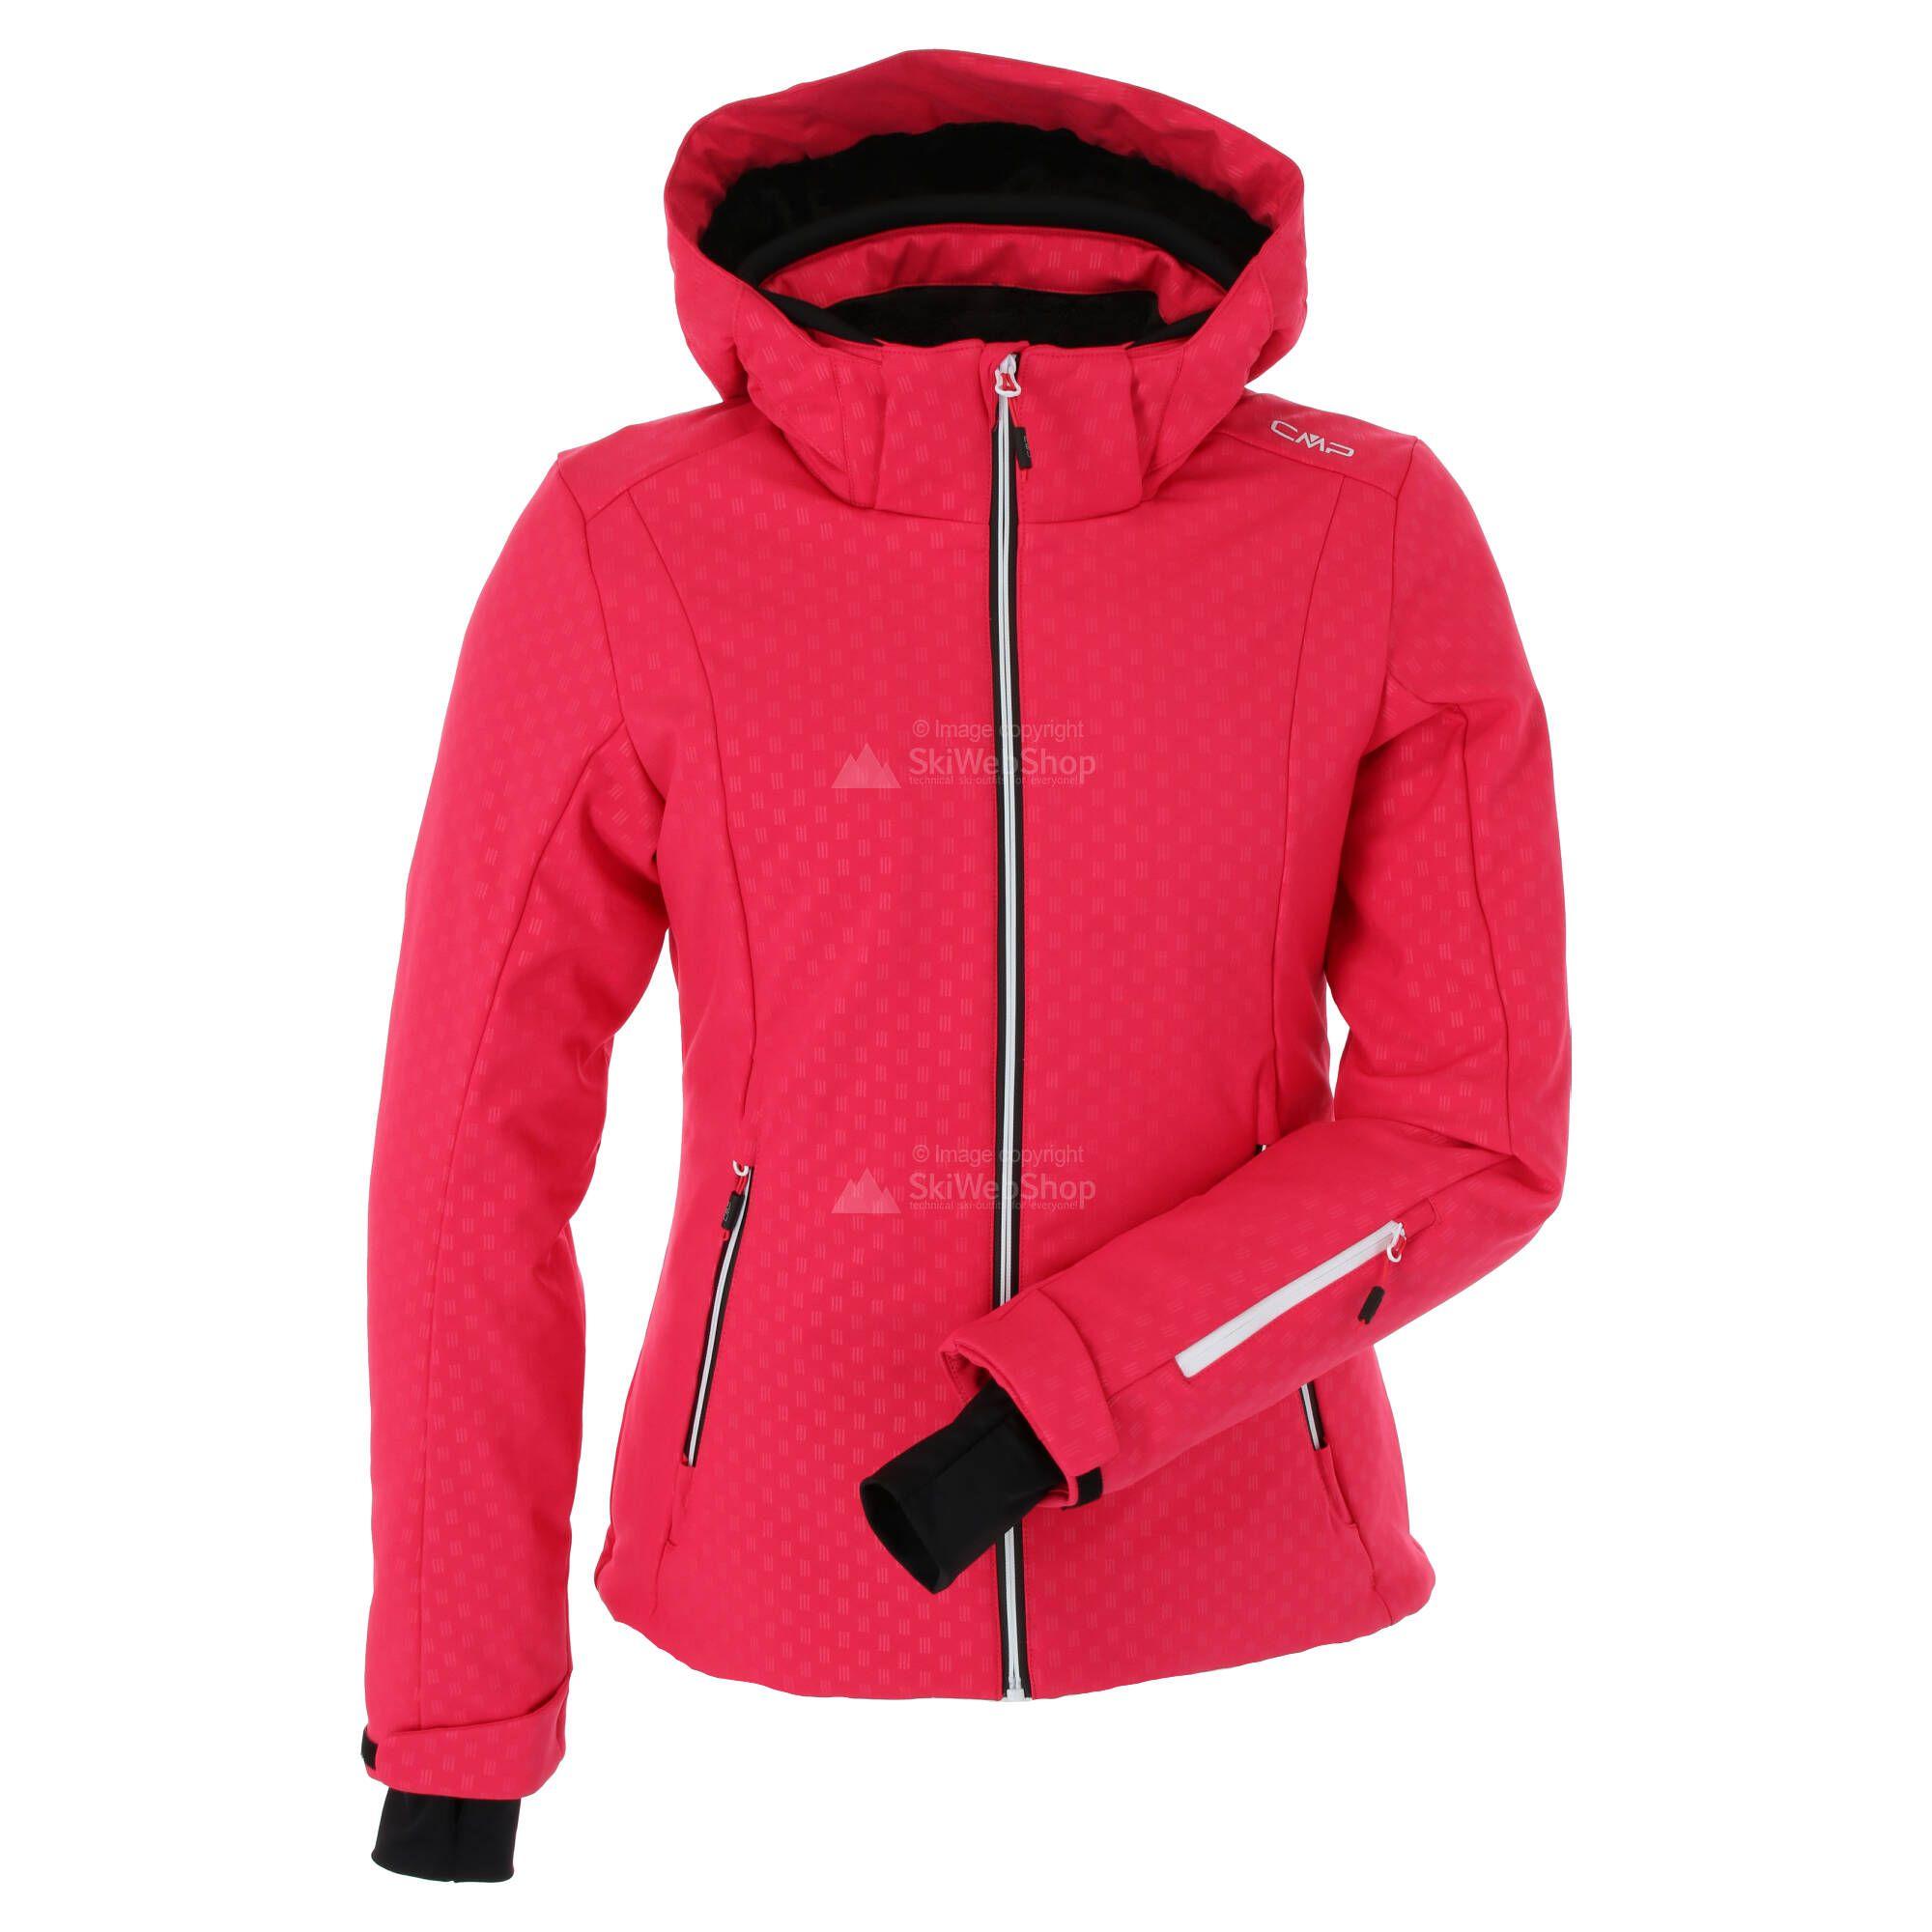 CMP, Softshell jacket zip hood, Softshell Skijacke, Damen